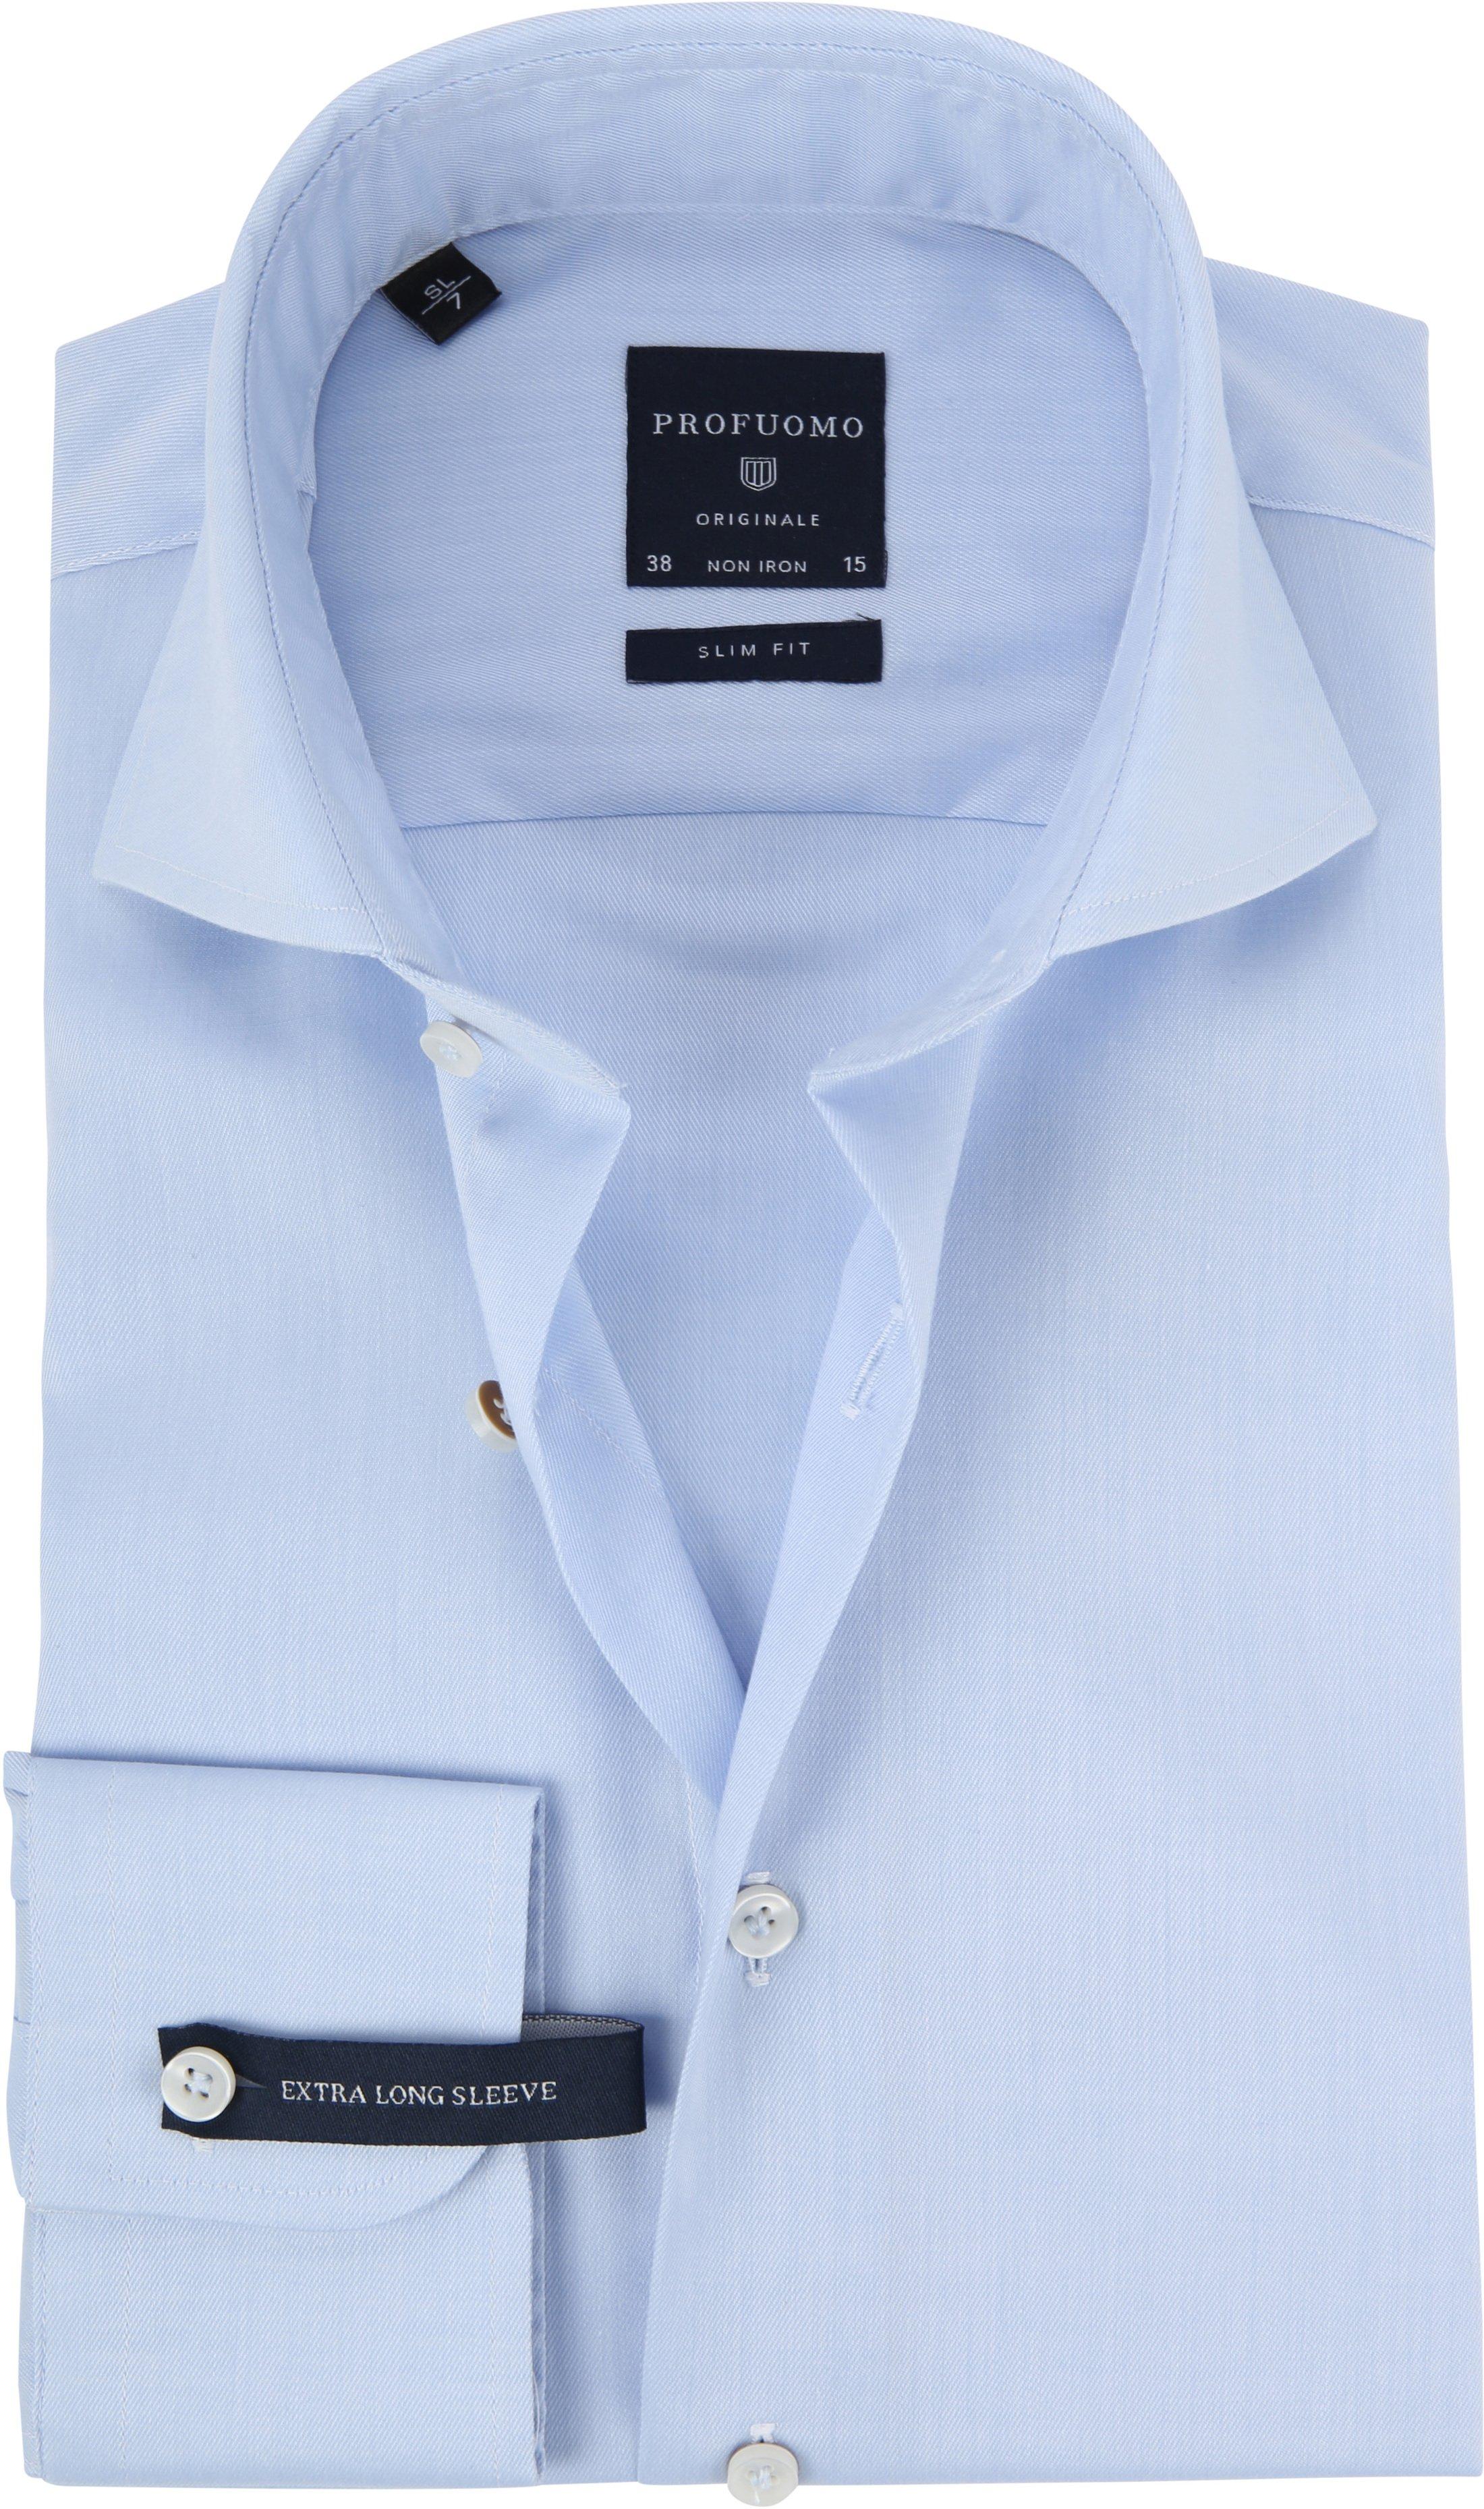 Profuomo Shirt Extra Long Sleeve Cutaway Light Blue